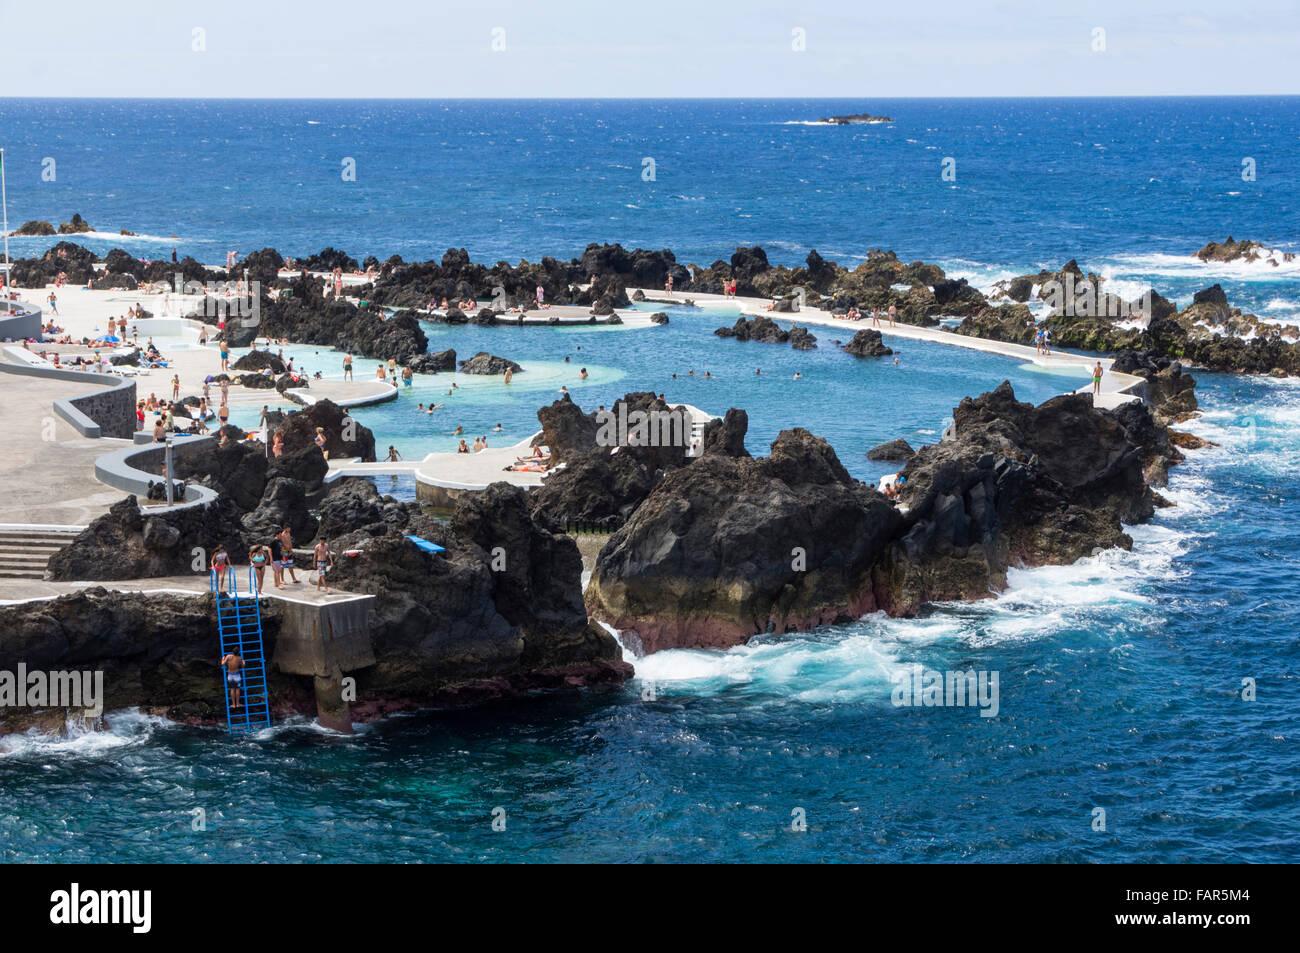 Madeira Porto Moniz Natural Lava Sea Swimming Pools In The Rocks Stock Photo Royalty Free